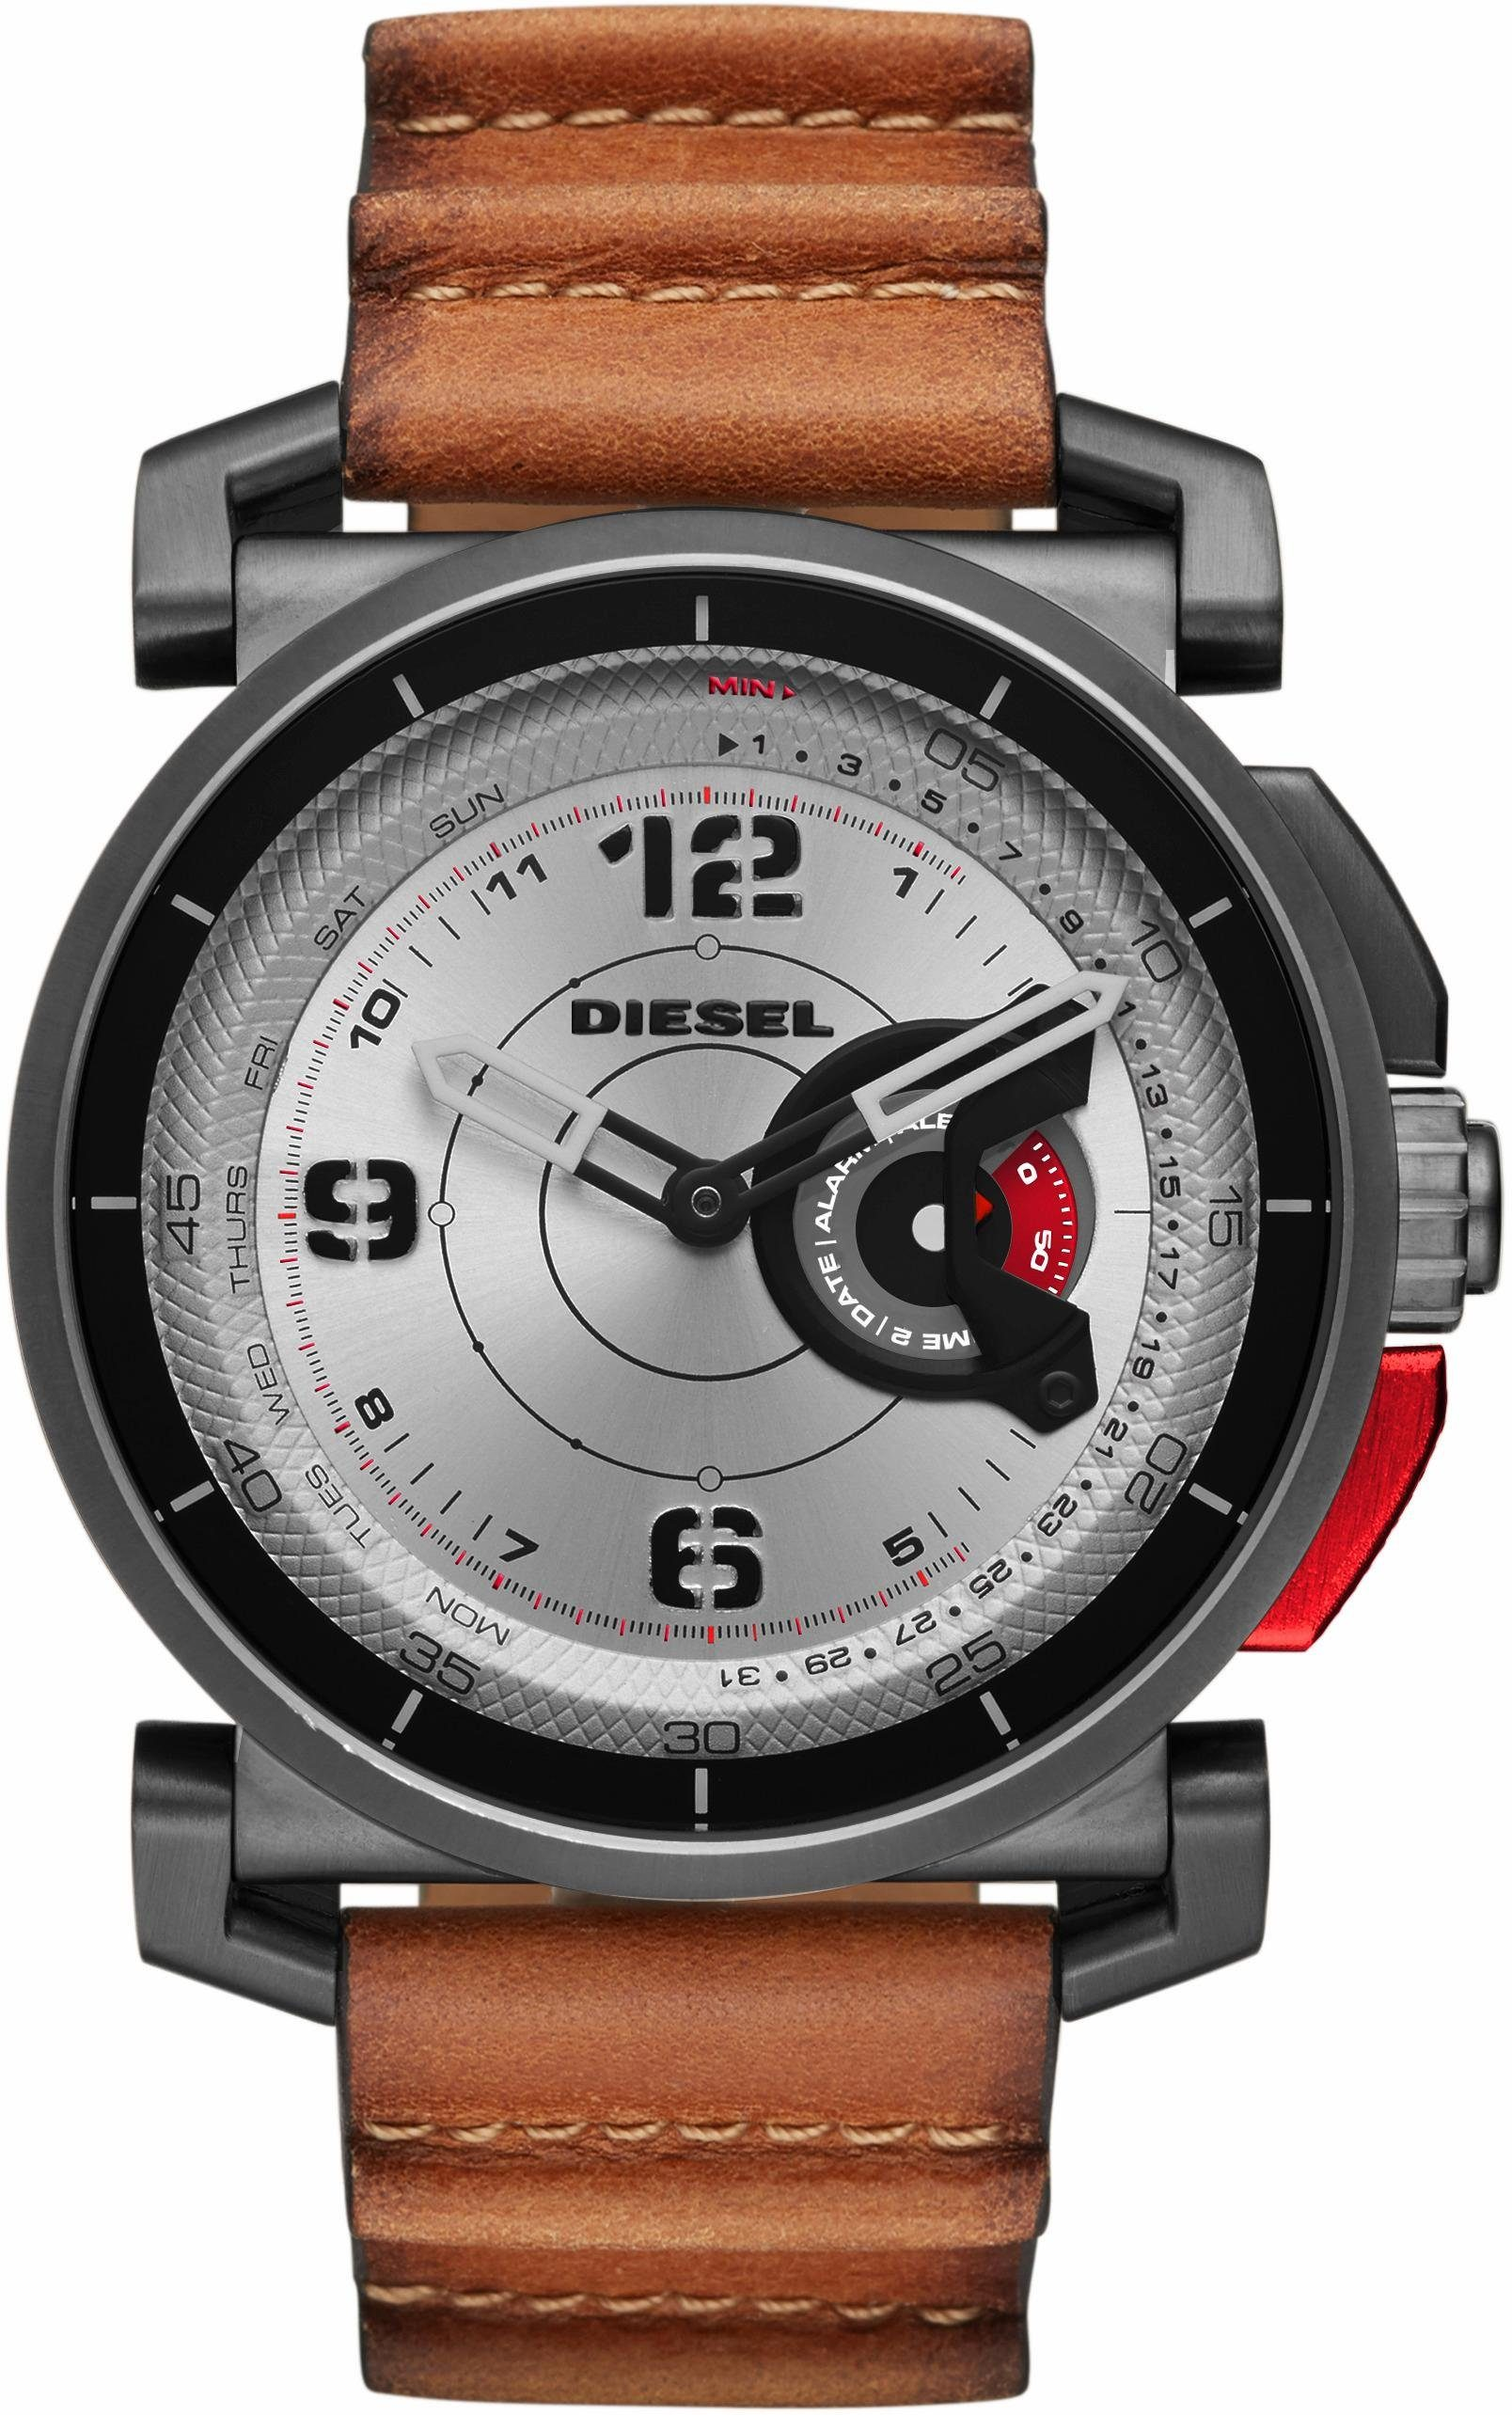 DIESEL ON ADVANCED, DZT1002 Smartwatch (Android Wear)